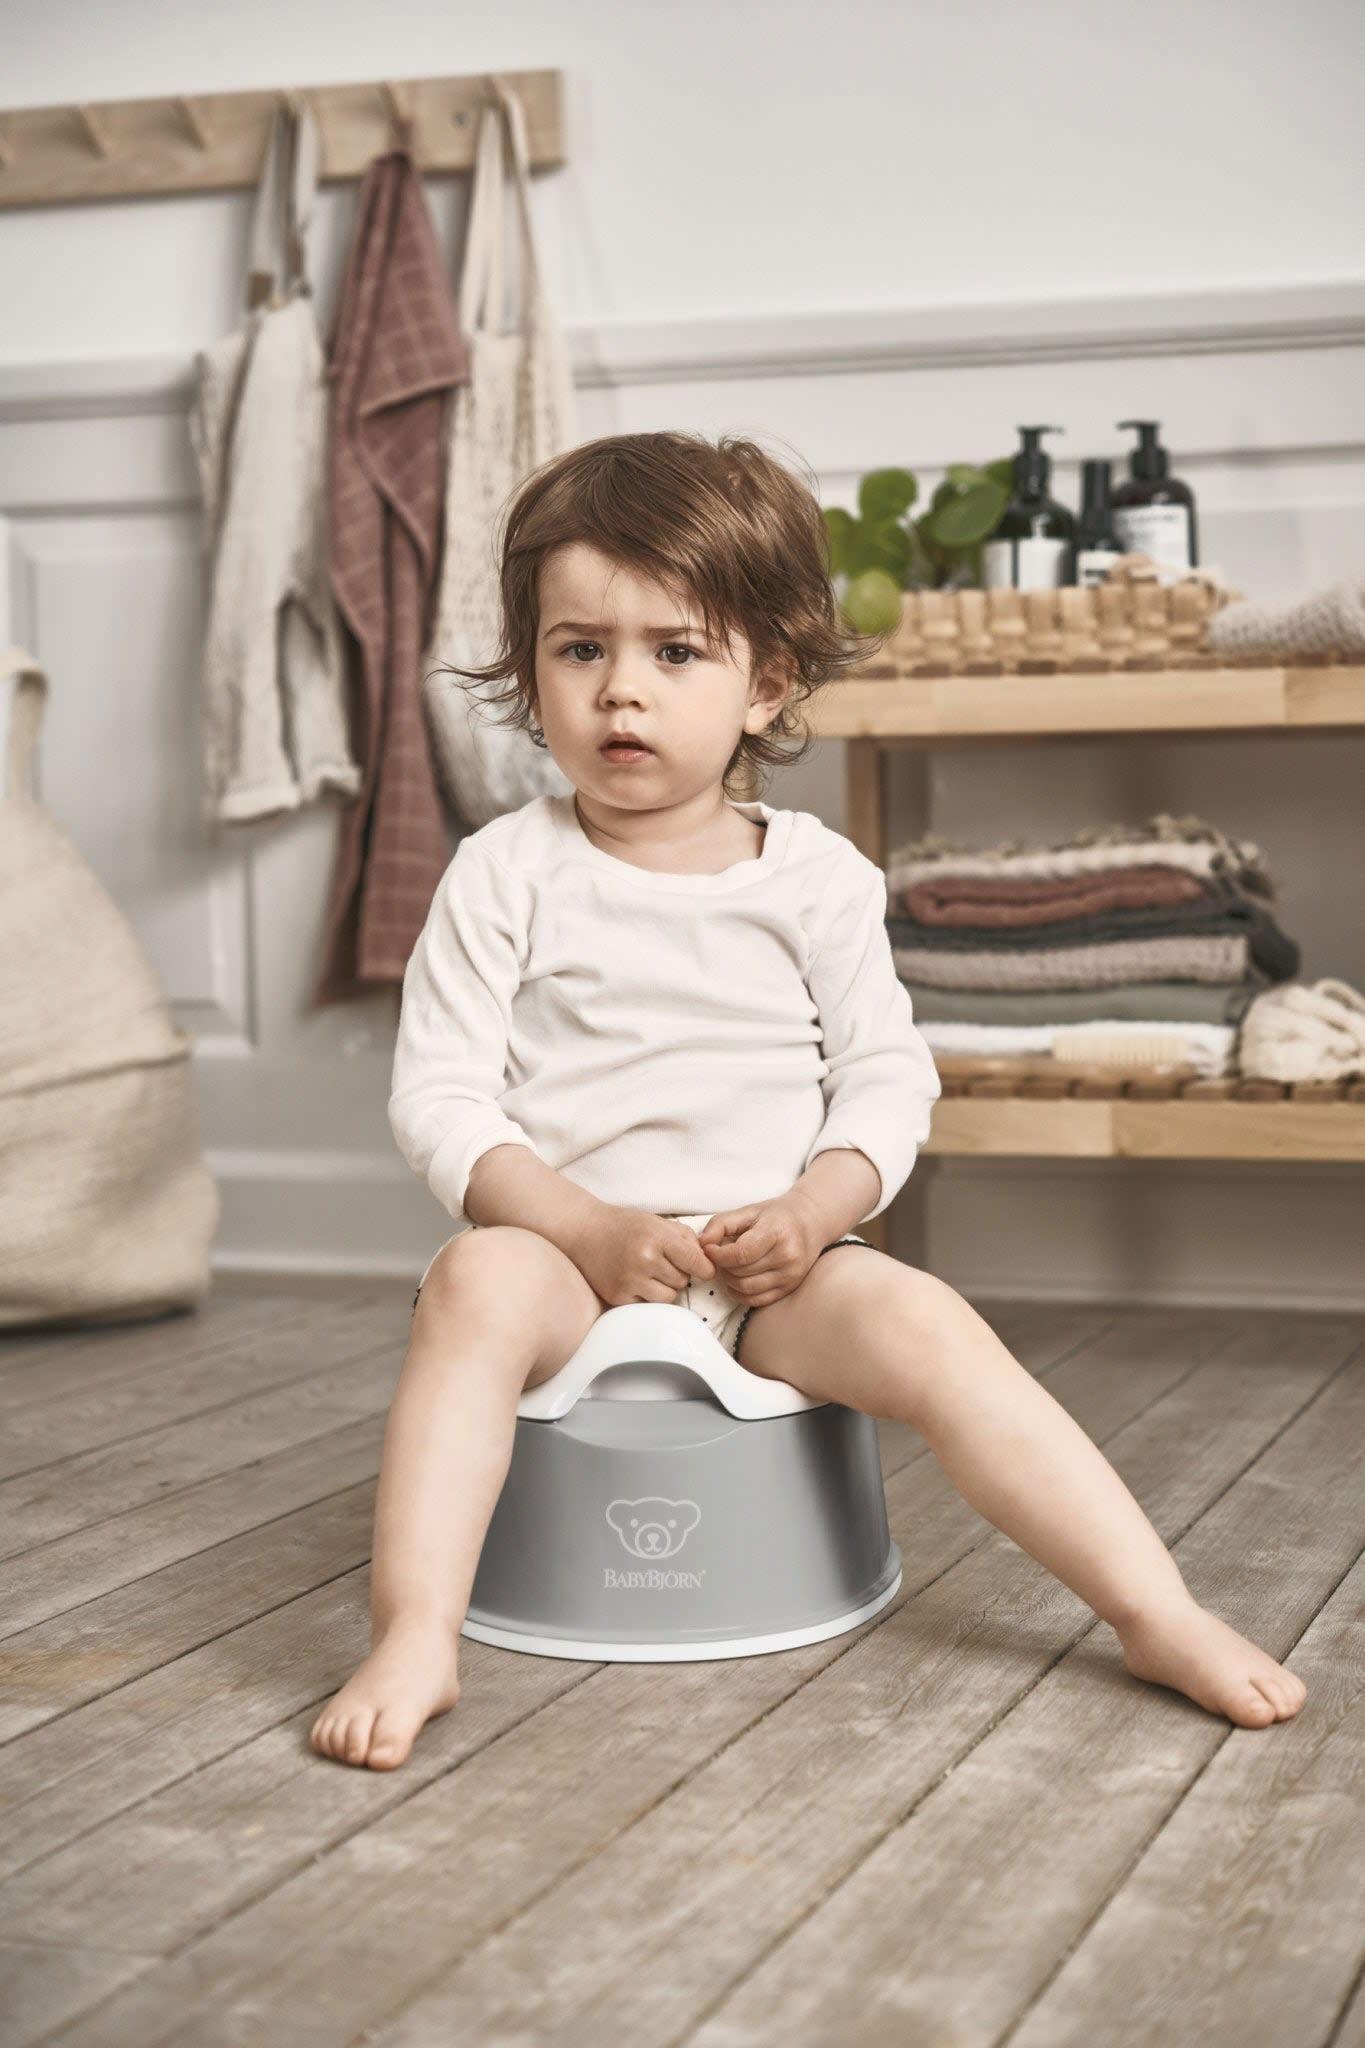 BabyBjorn BabyBjorn Smart Potty Grey/White